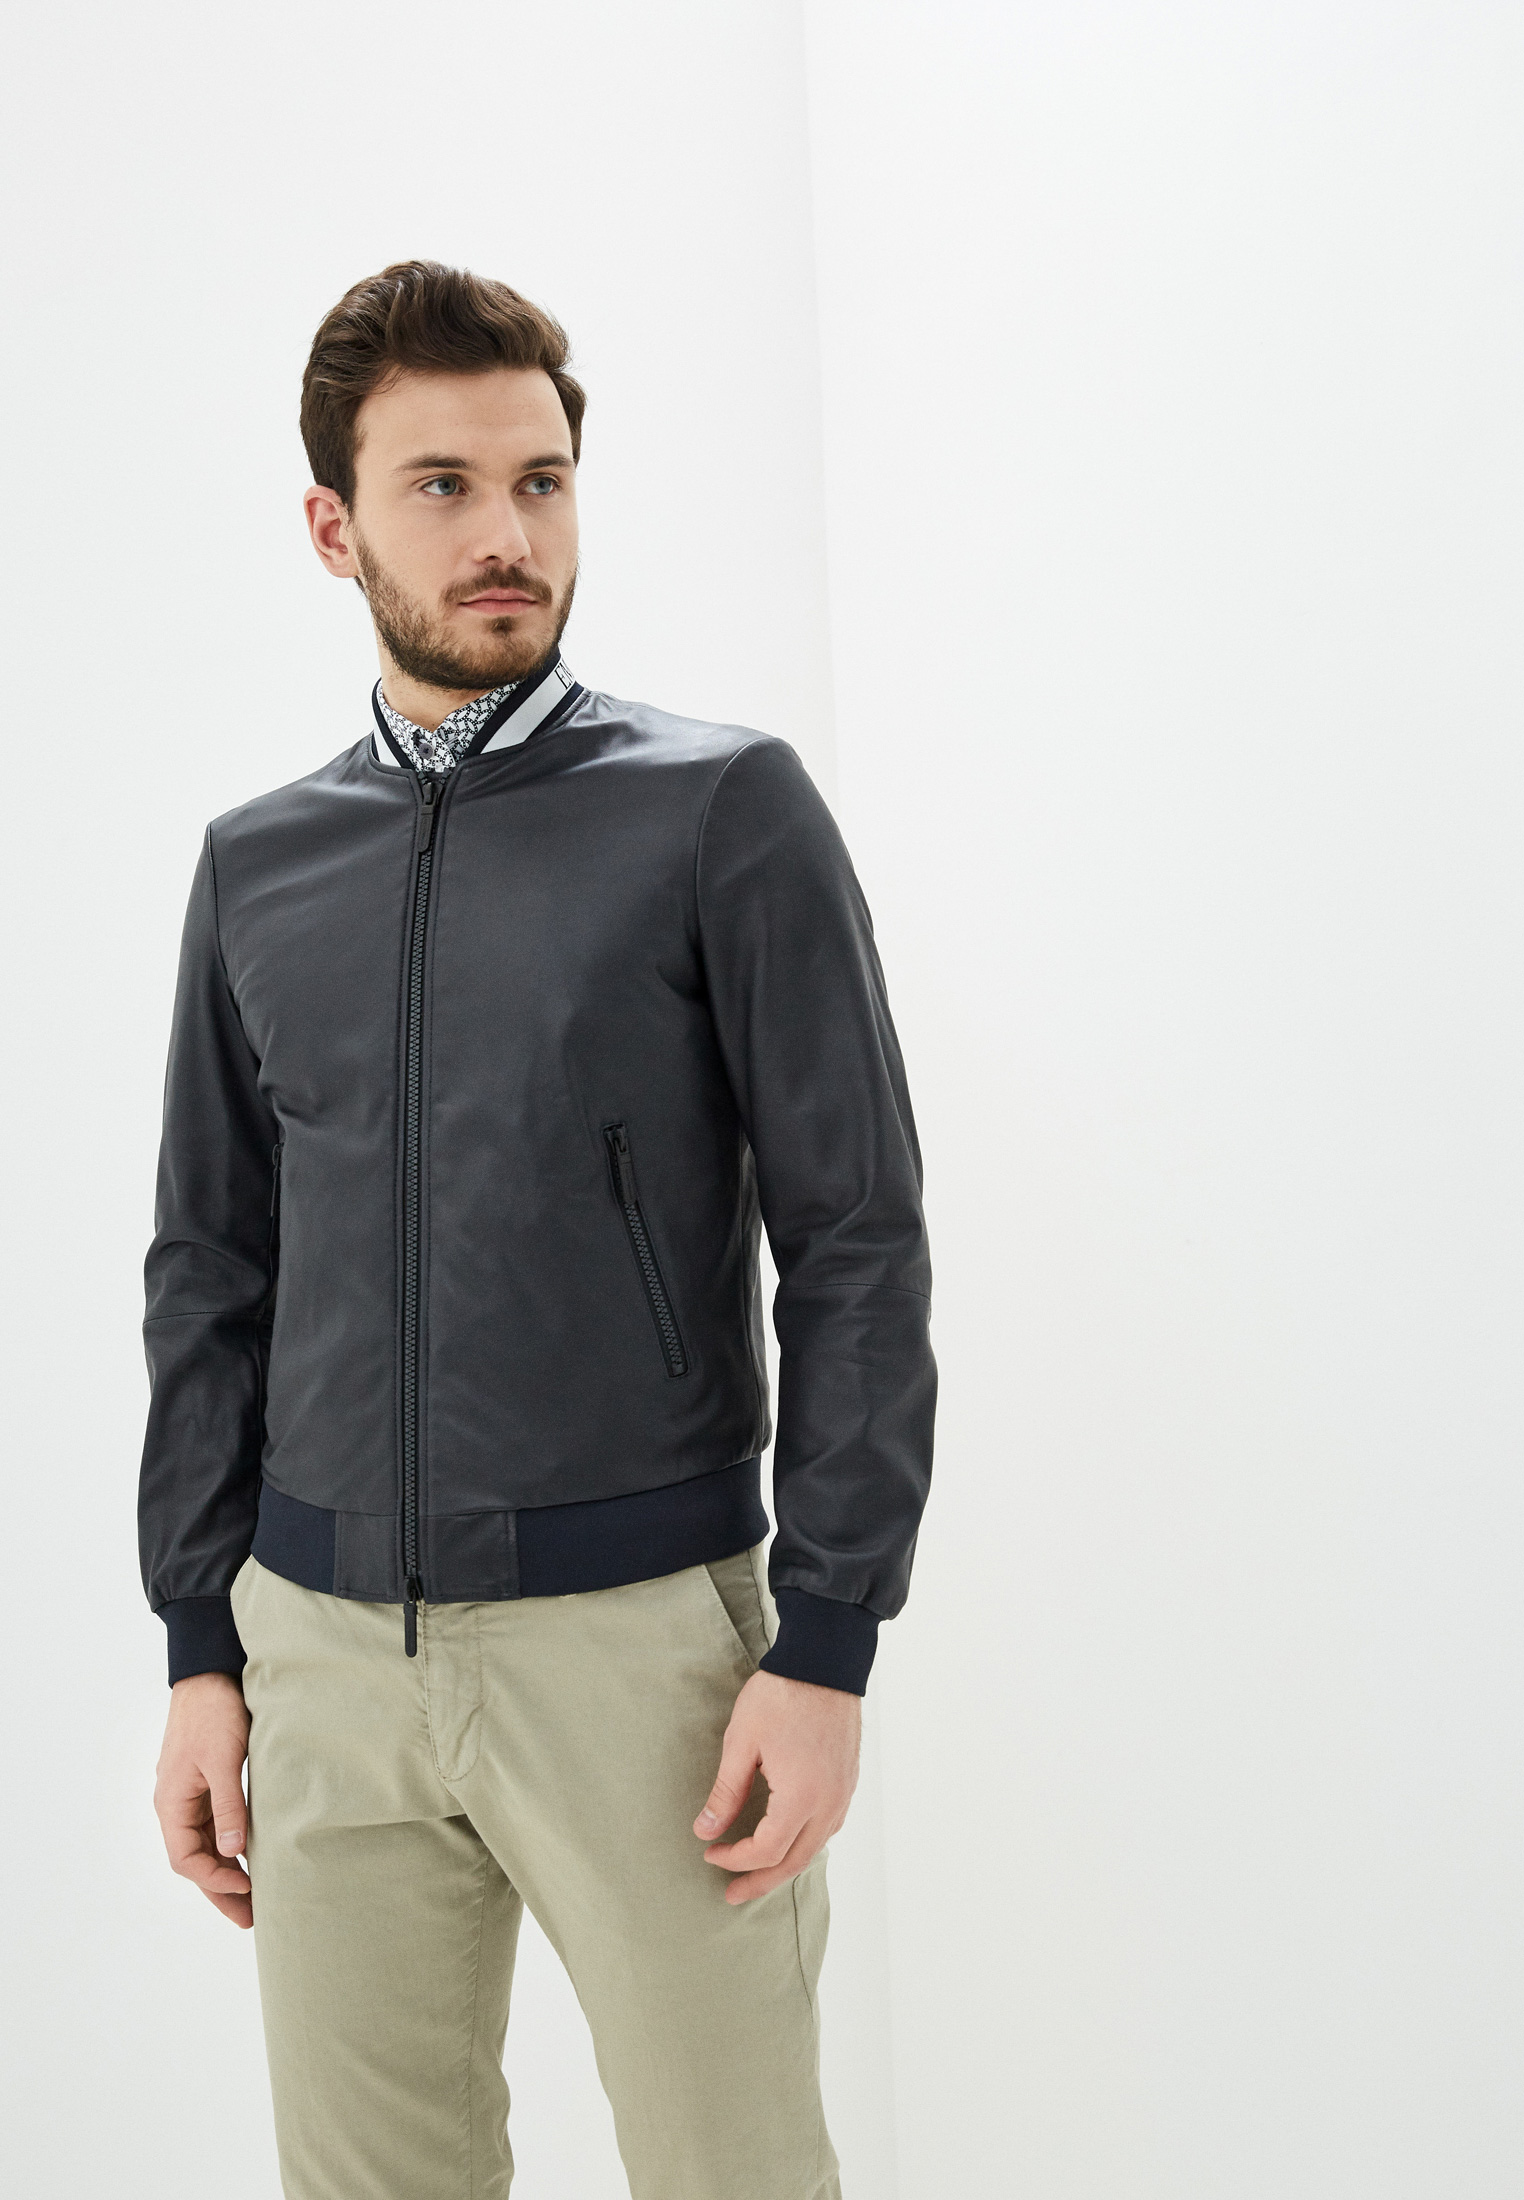 Кожаная куртка Emporio Armani 51b51p 51P51